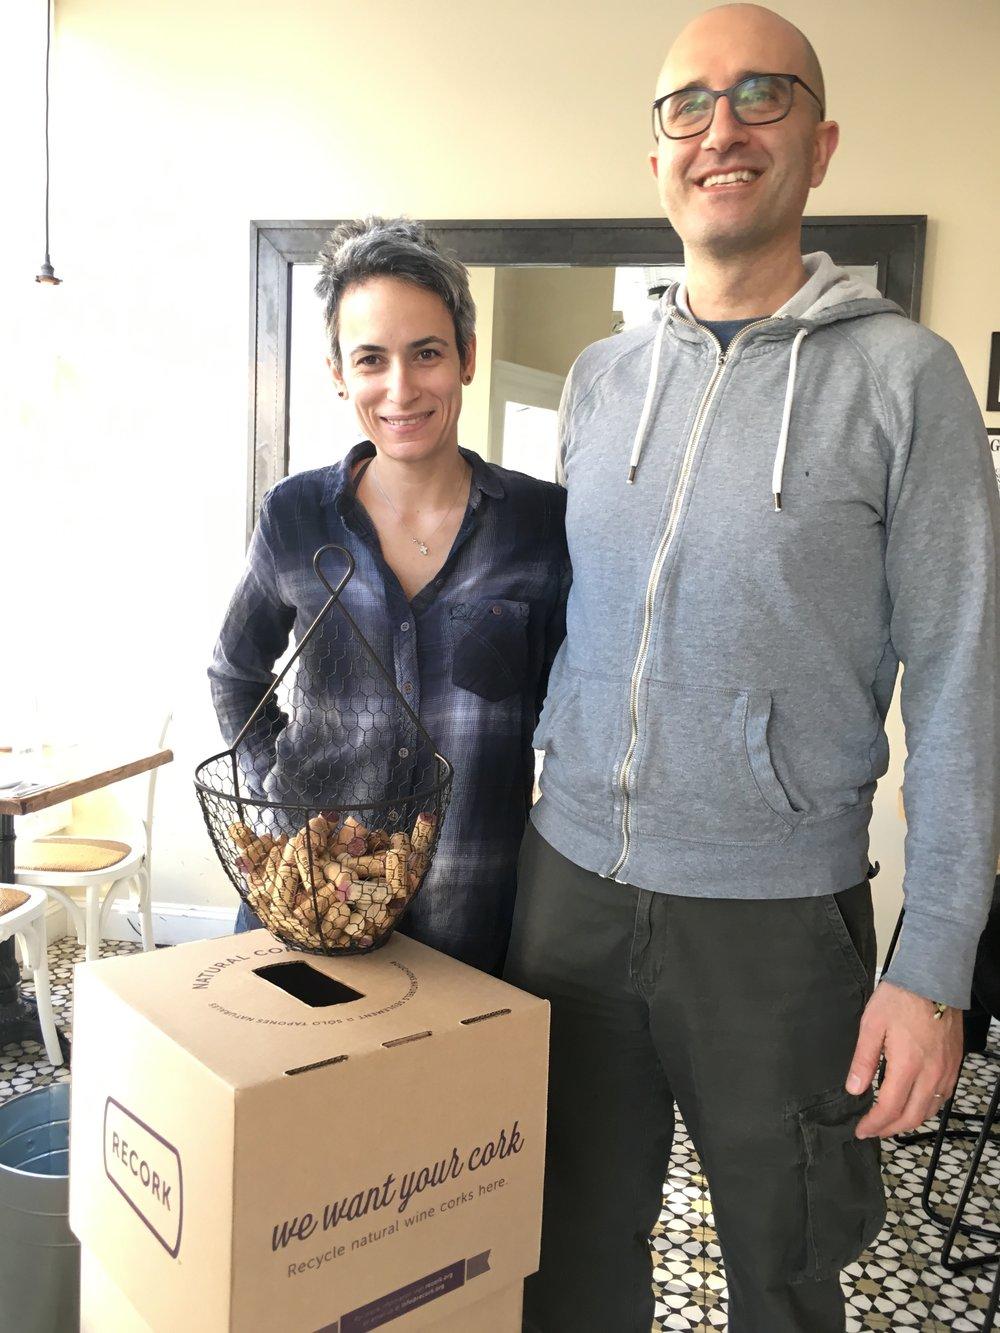 Rosemary & Vine Owners Berj Yeretzian and Tania Rahal